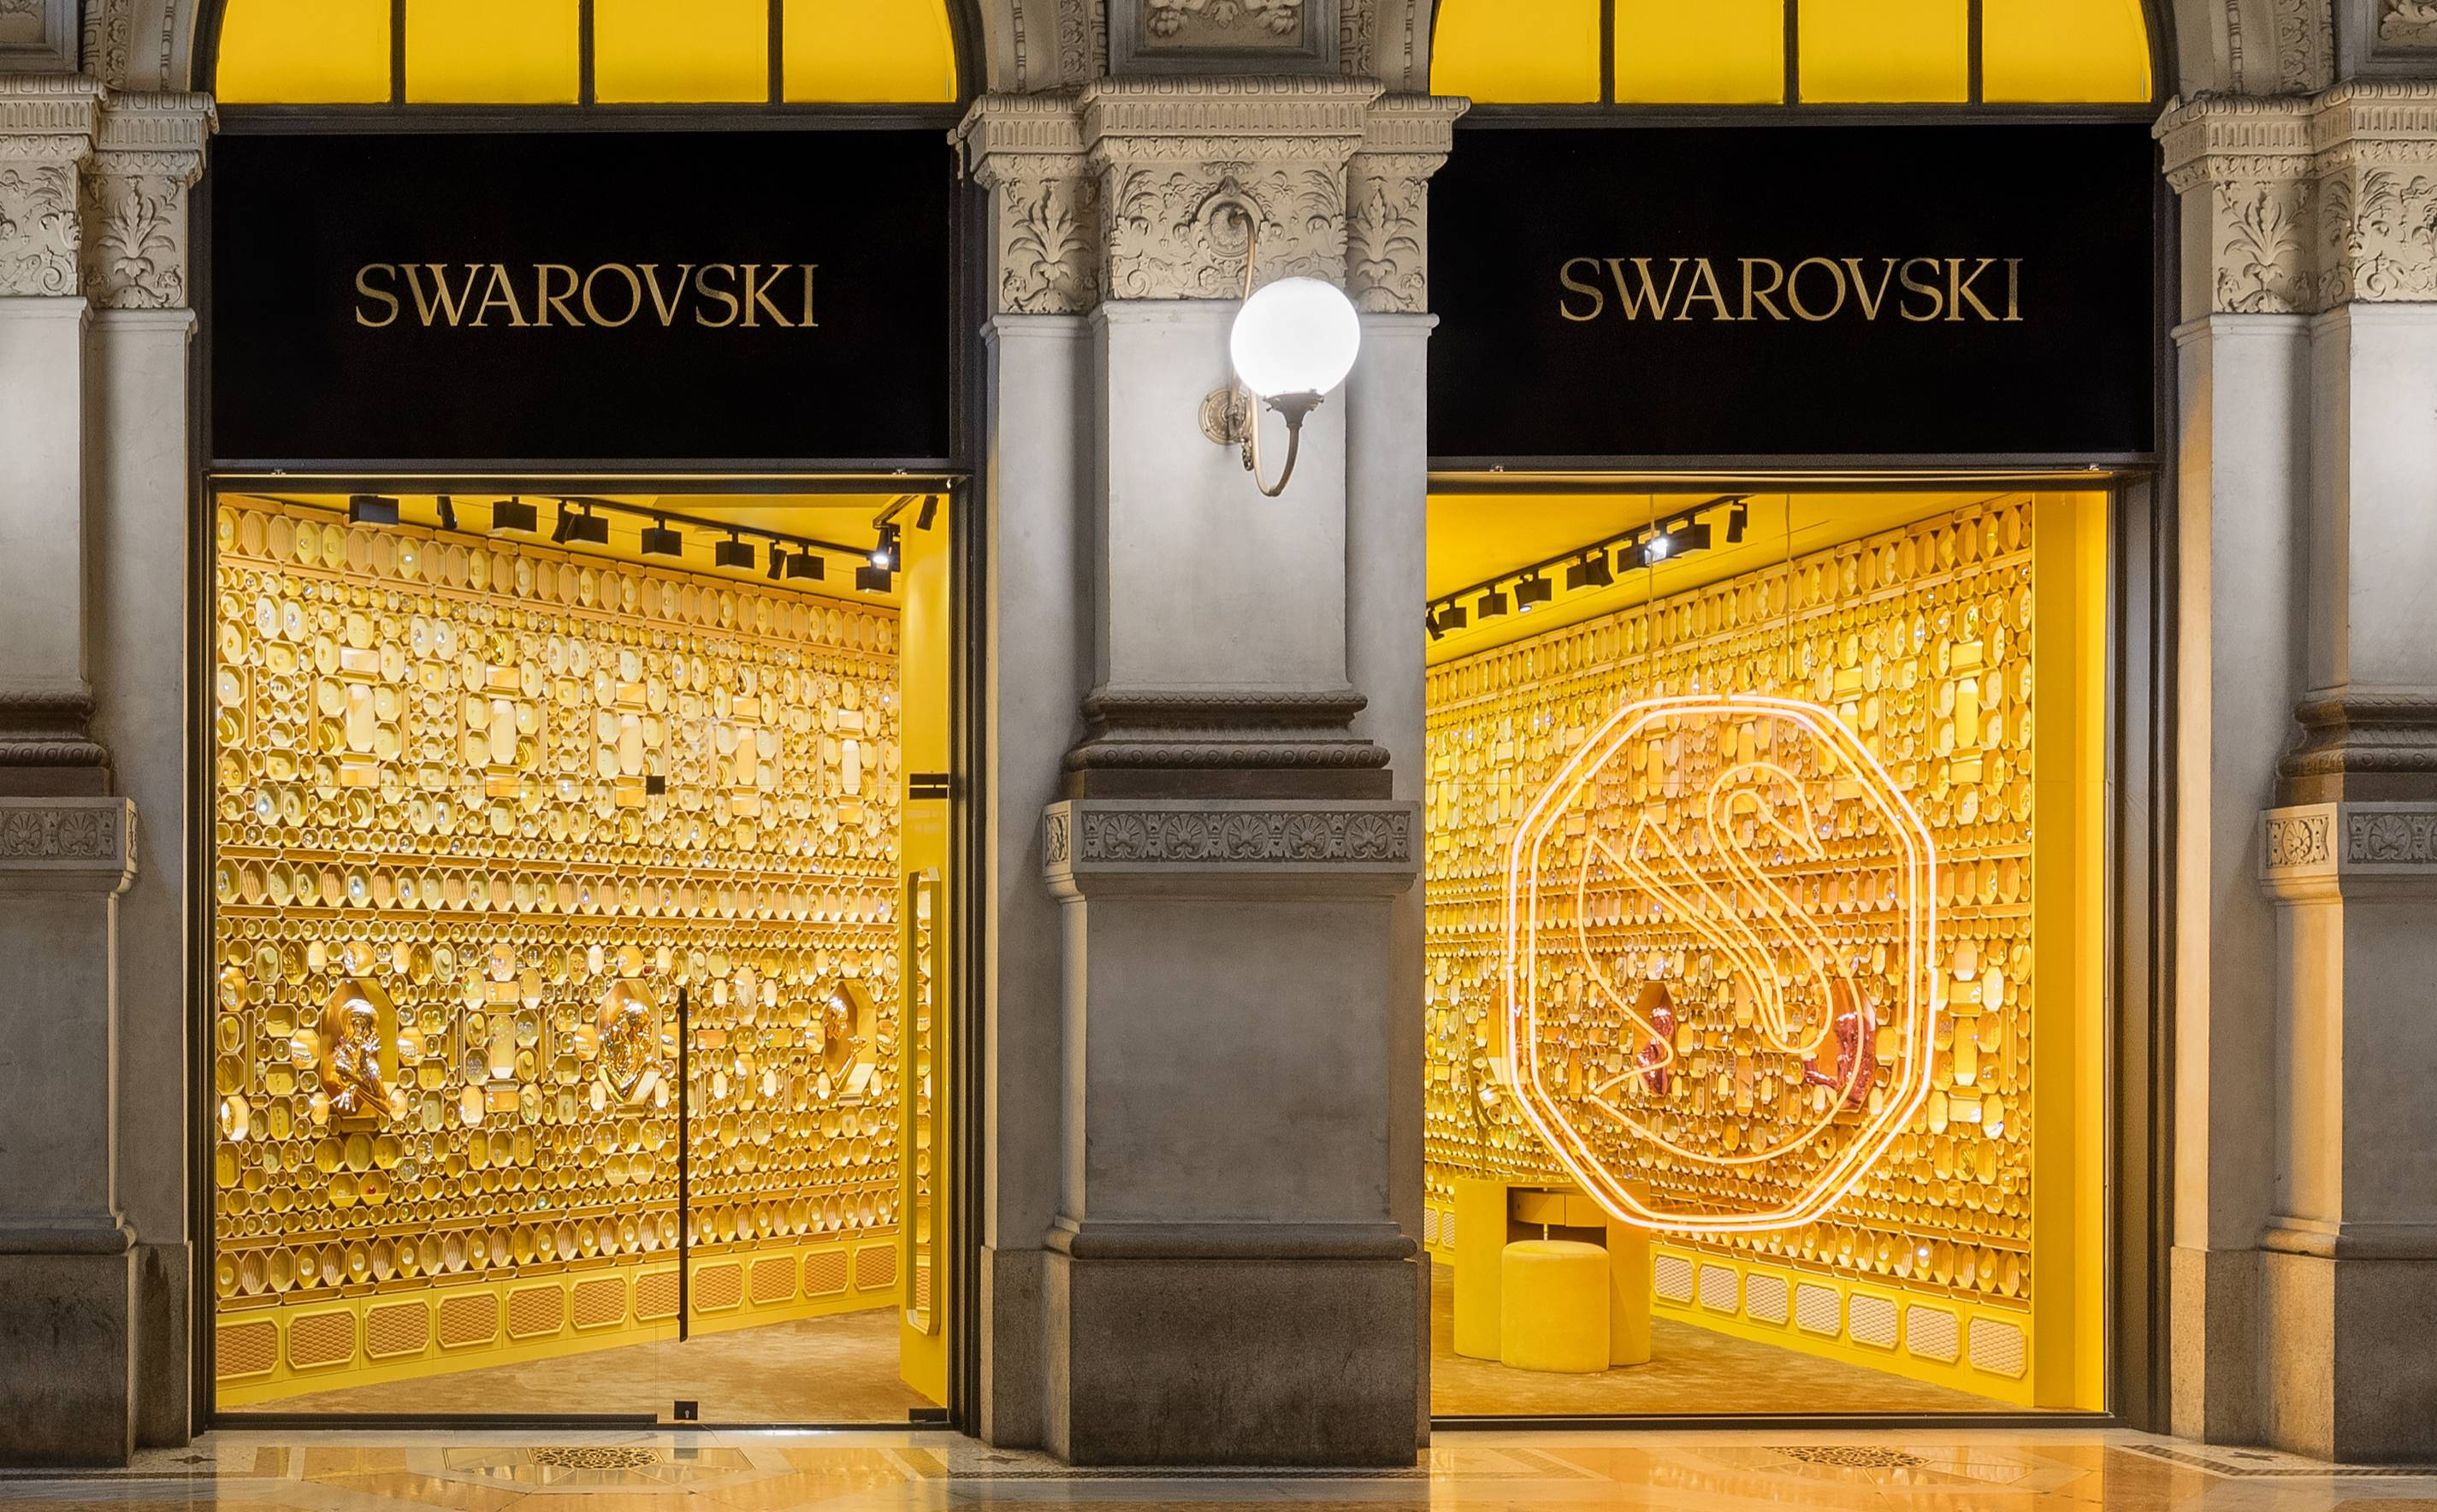 Swarovski reveals new brand identity and store redesign